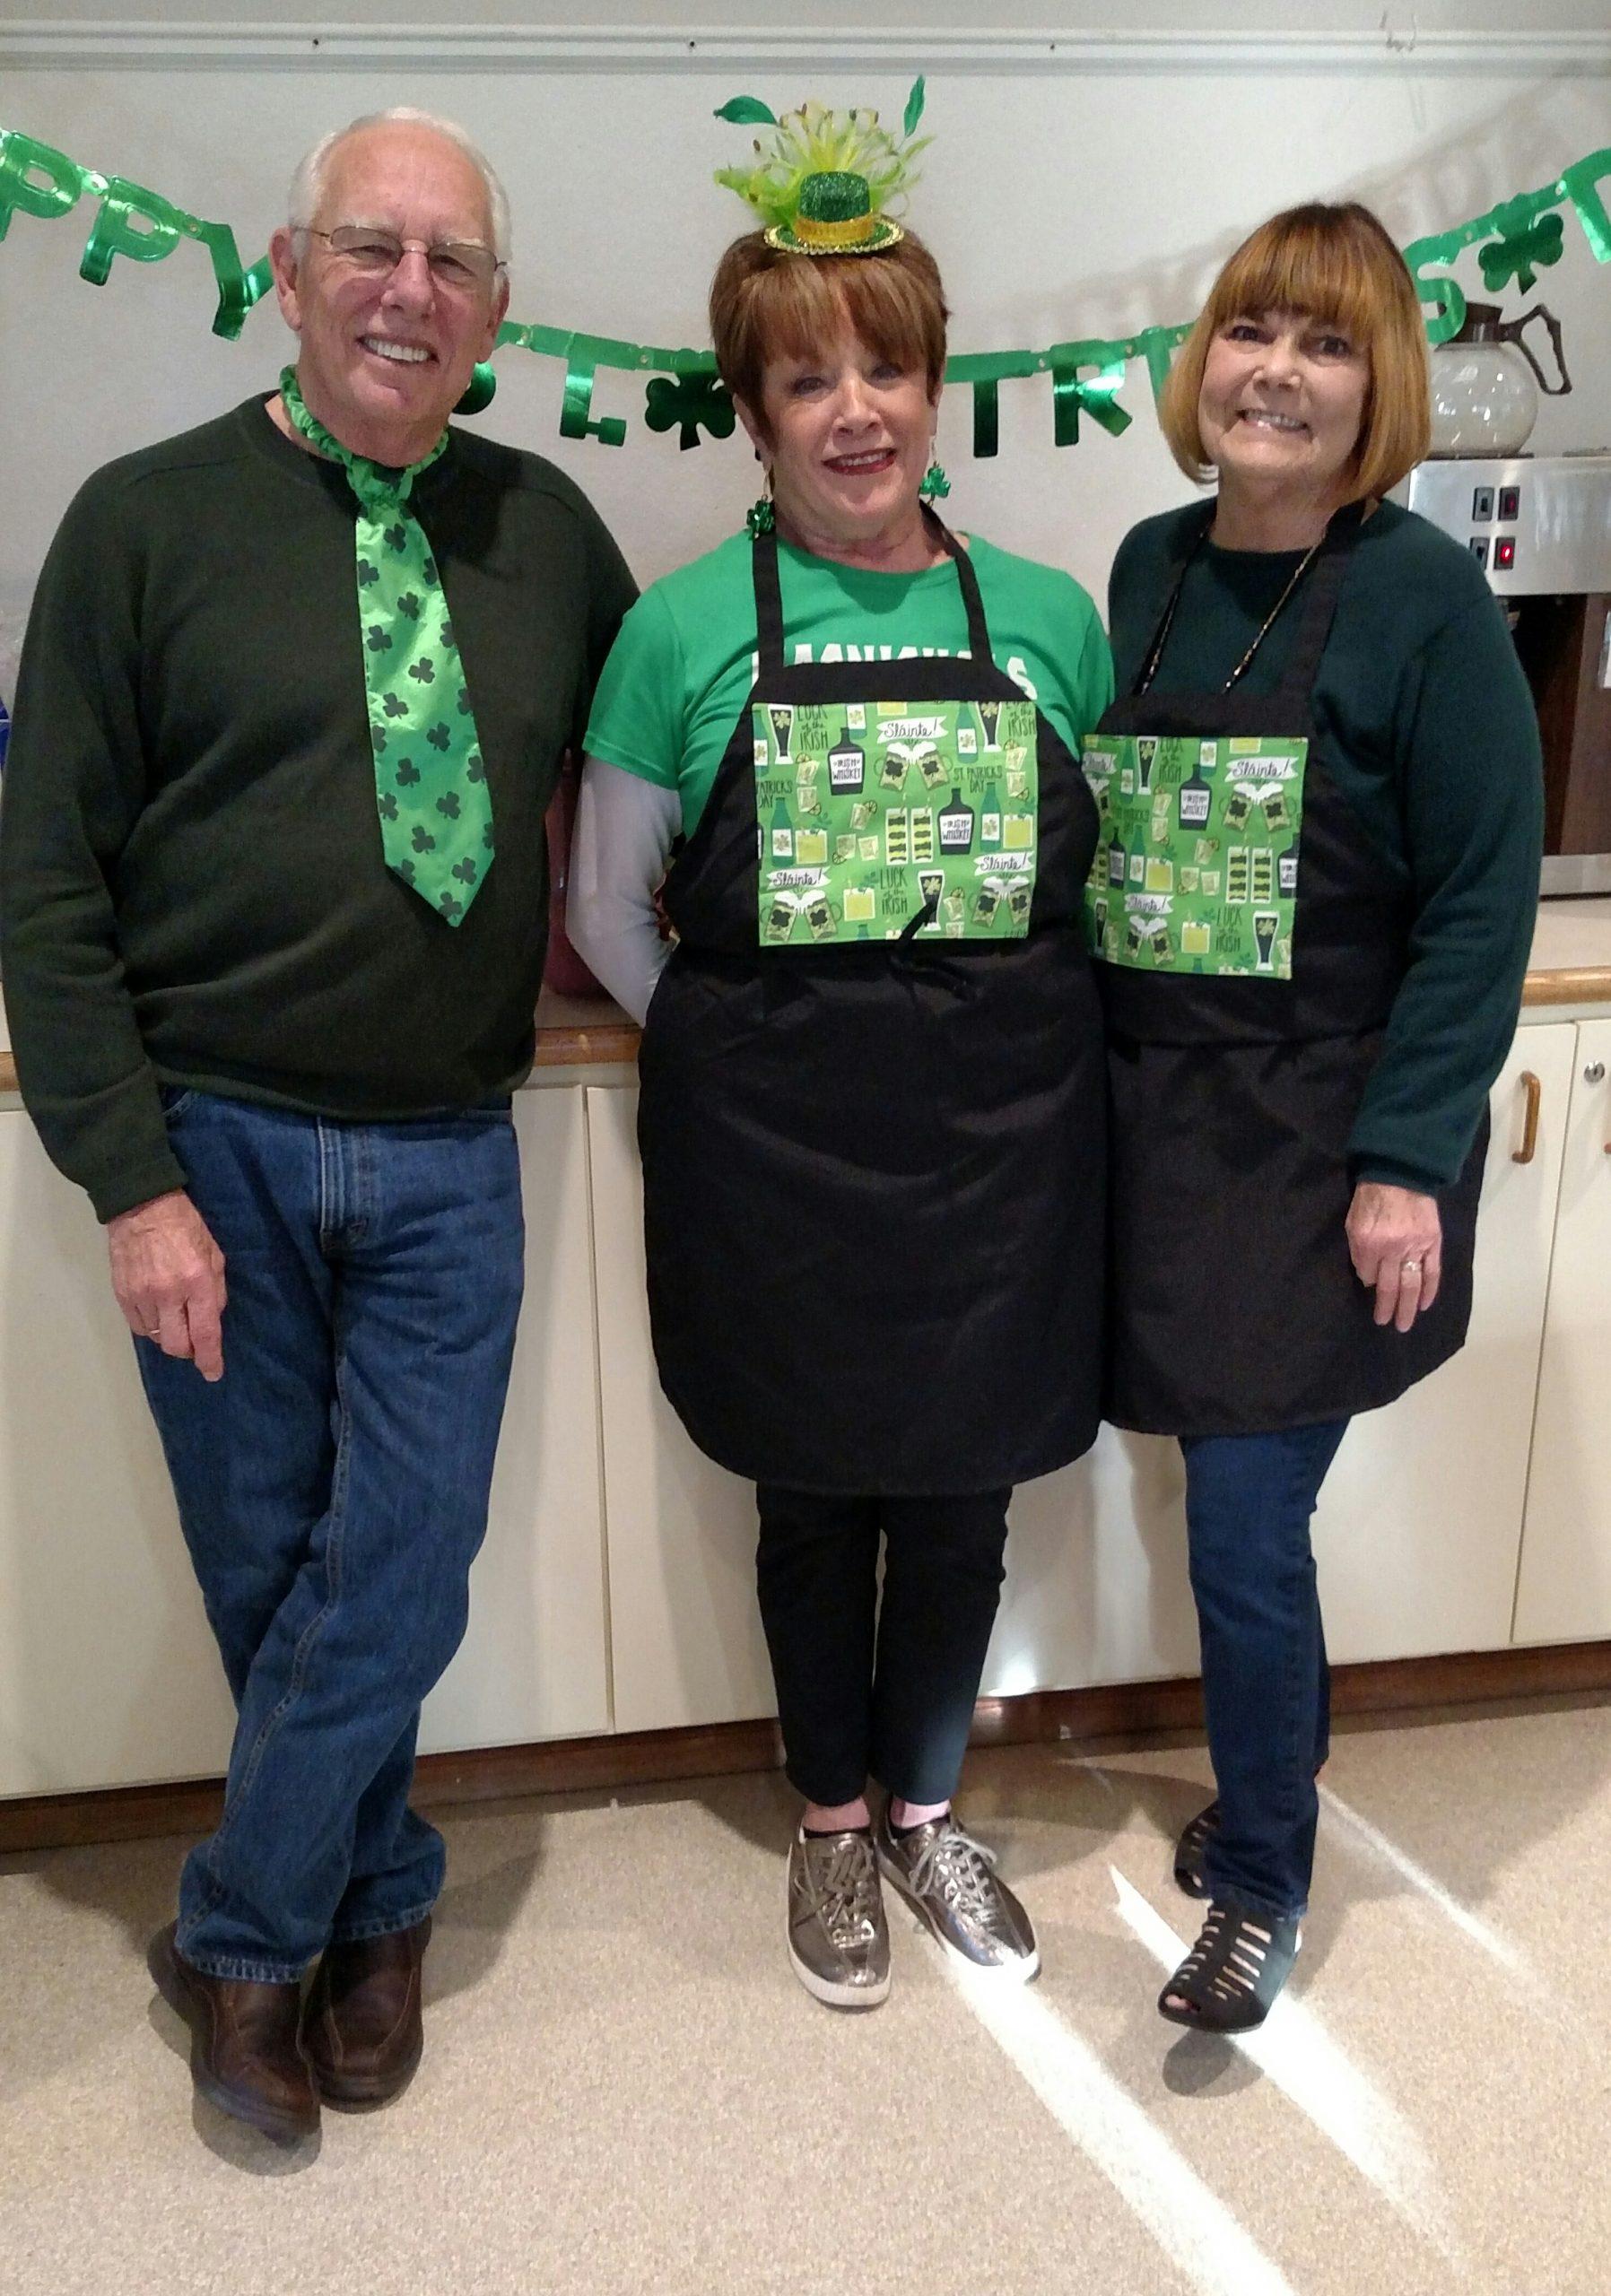 St Pats 2018 3 volunteers